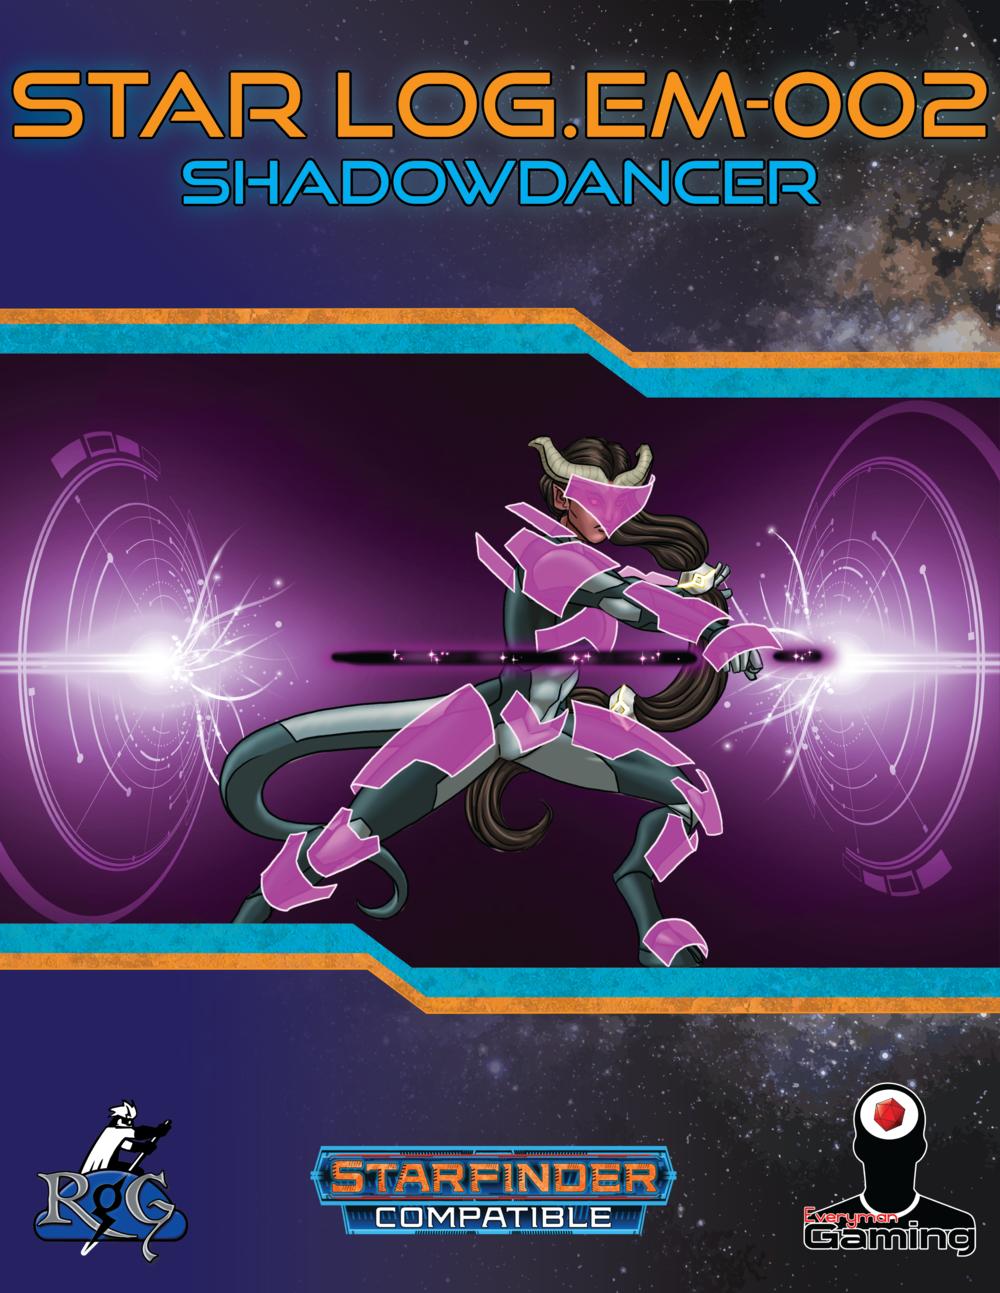 SF002_Shadowdancer.png